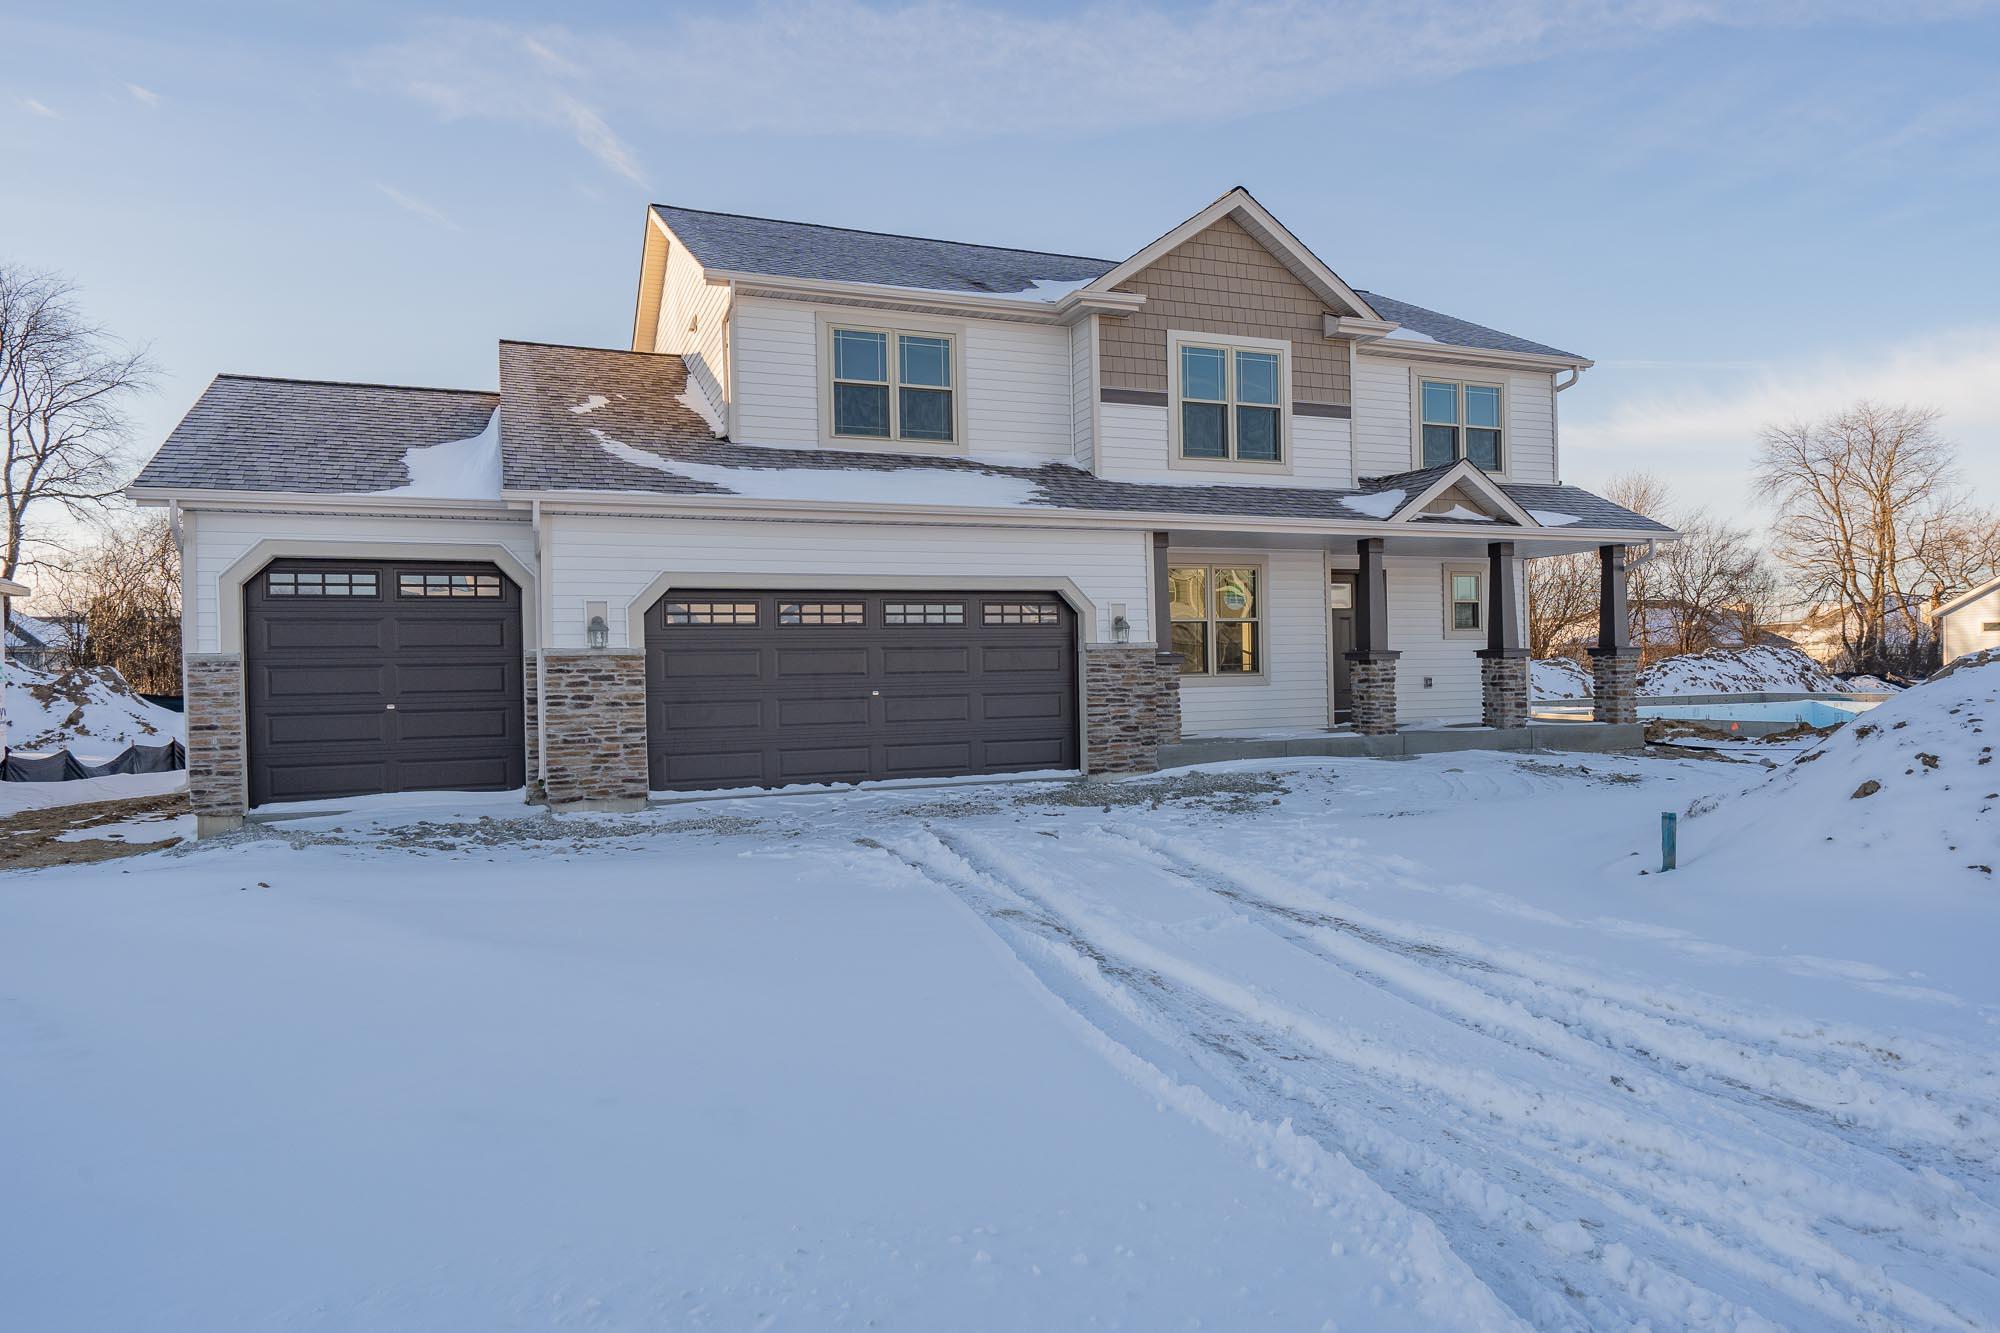 265 Silver Lake Trl, Oconomowoc, Wisconsin 53066, 4 Bedrooms Bedrooms, 9 Rooms Rooms,2 BathroomsBathrooms,Single-Family,For Sale,Silver Lake Trl,1612280